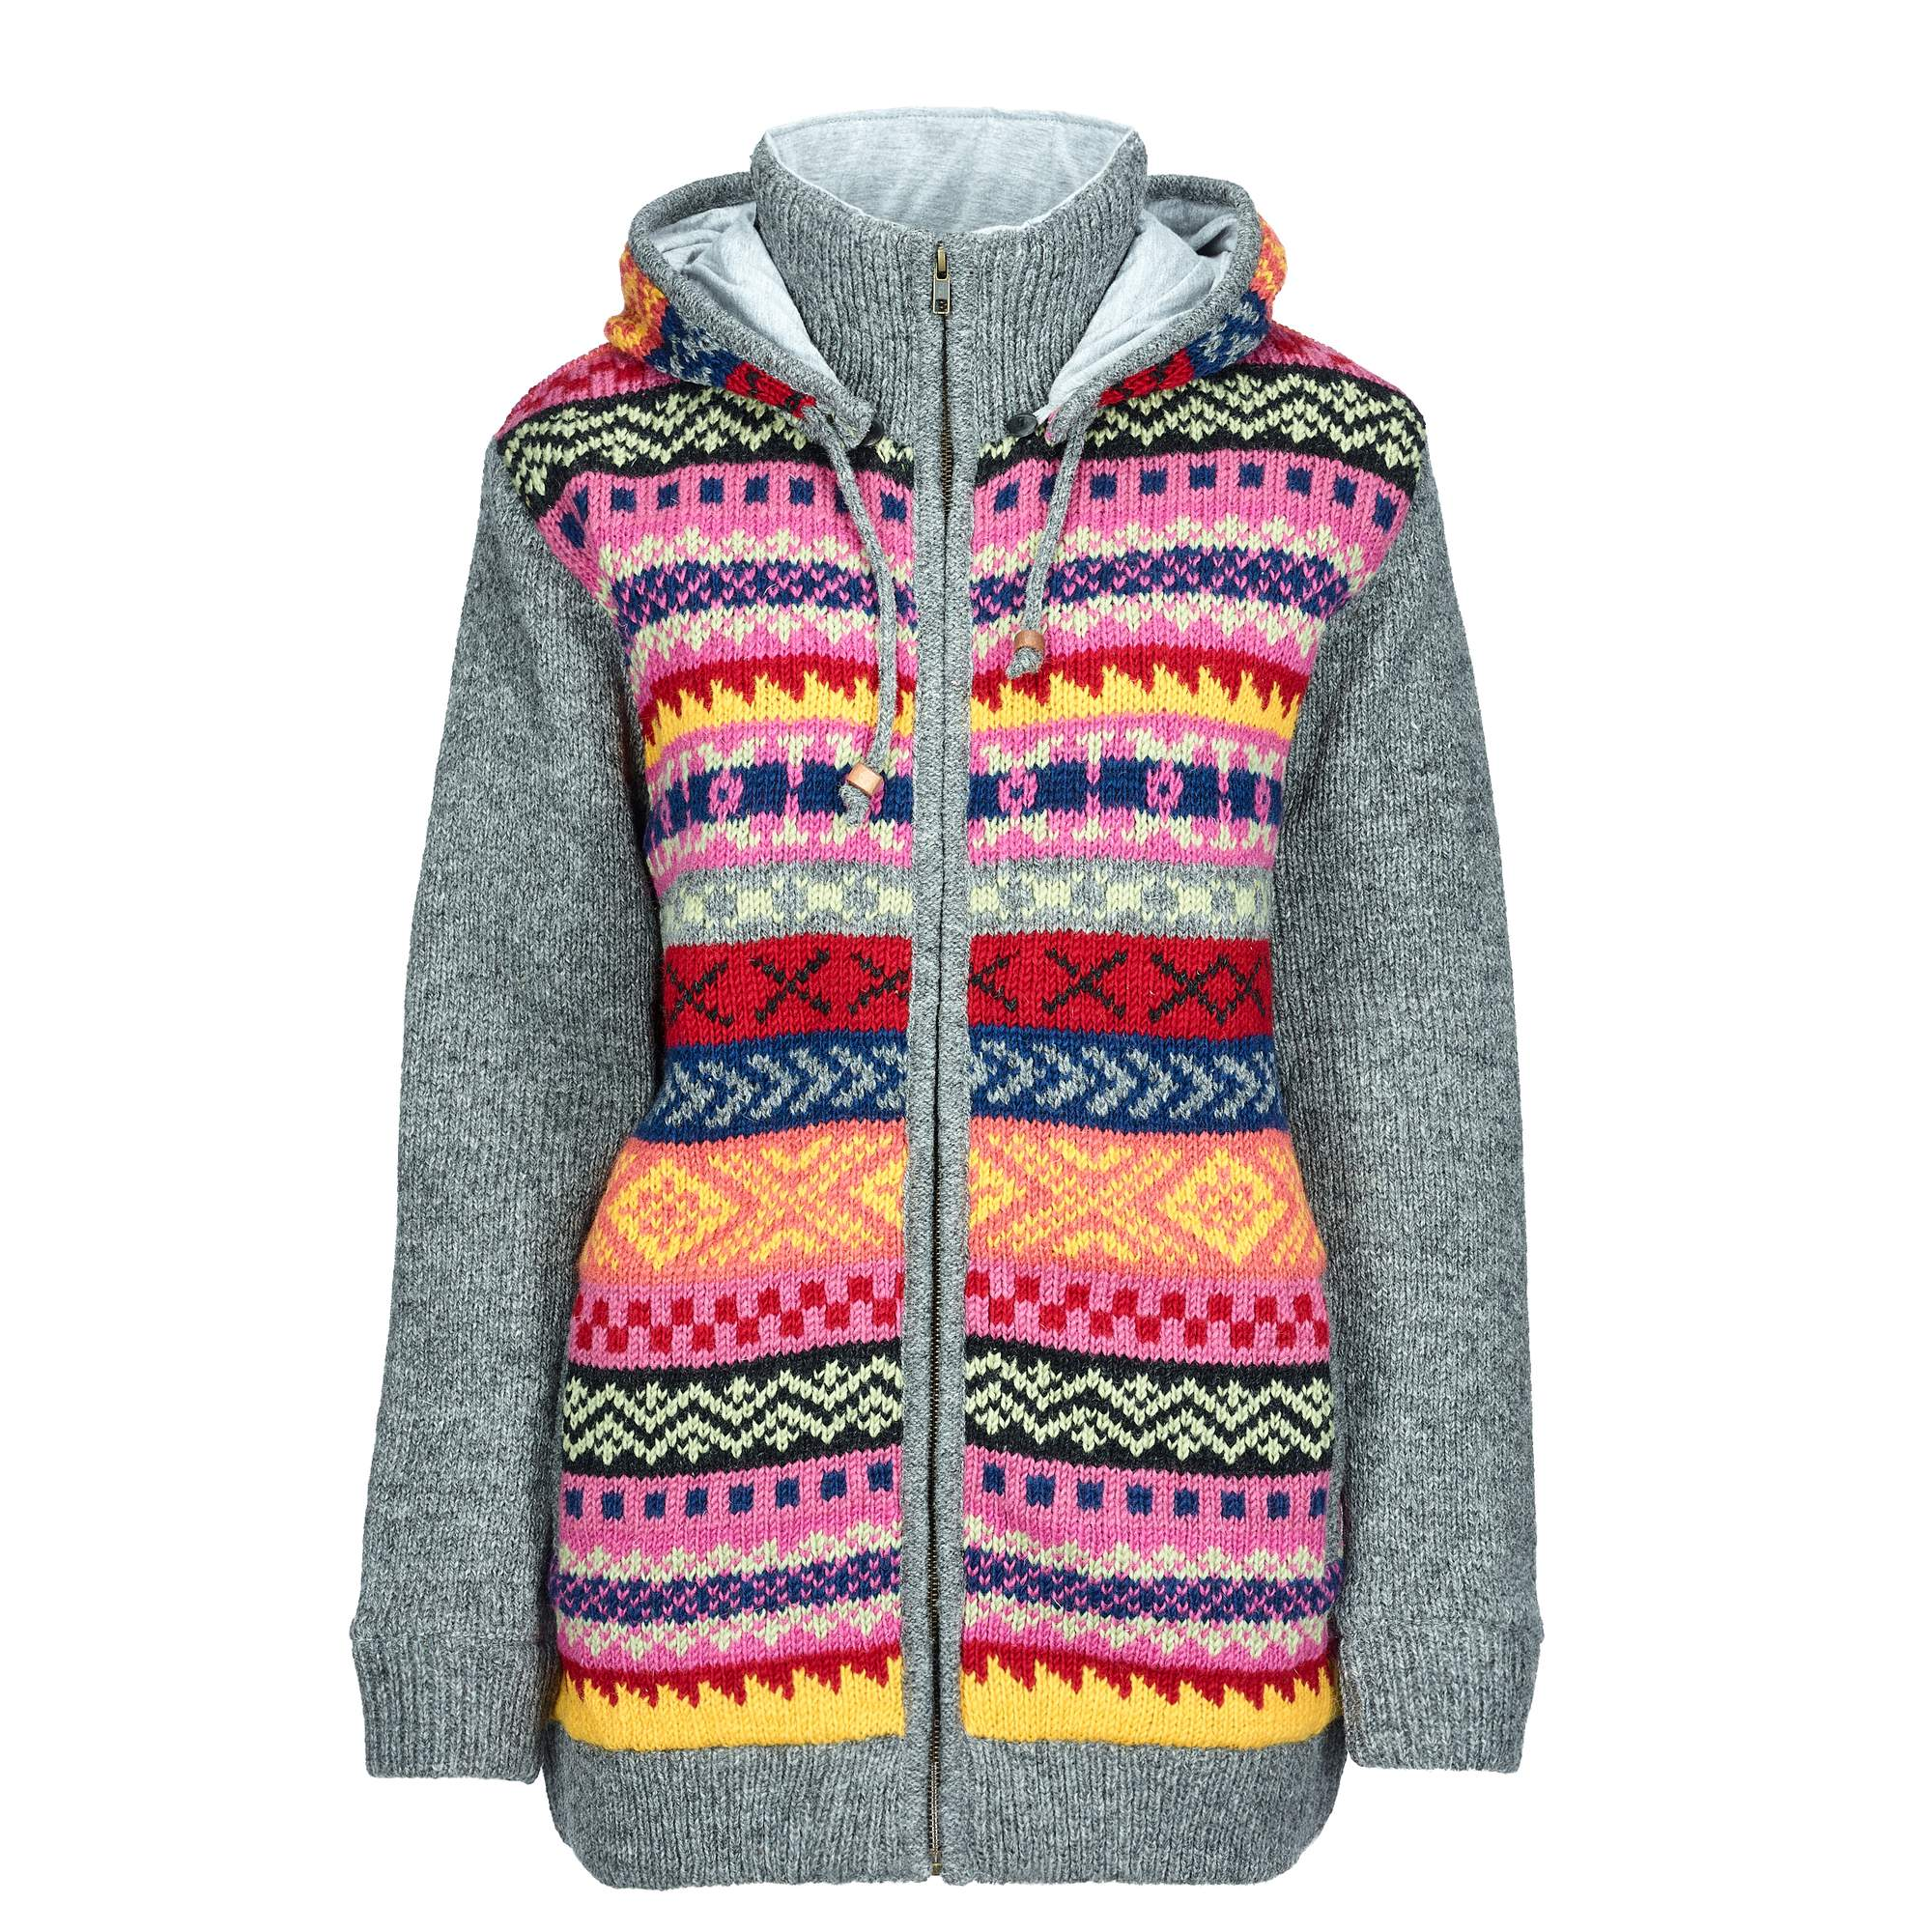 Himalaya Wooljacket Frauen Gr. S - Wolljacke - mehrfarbig grau